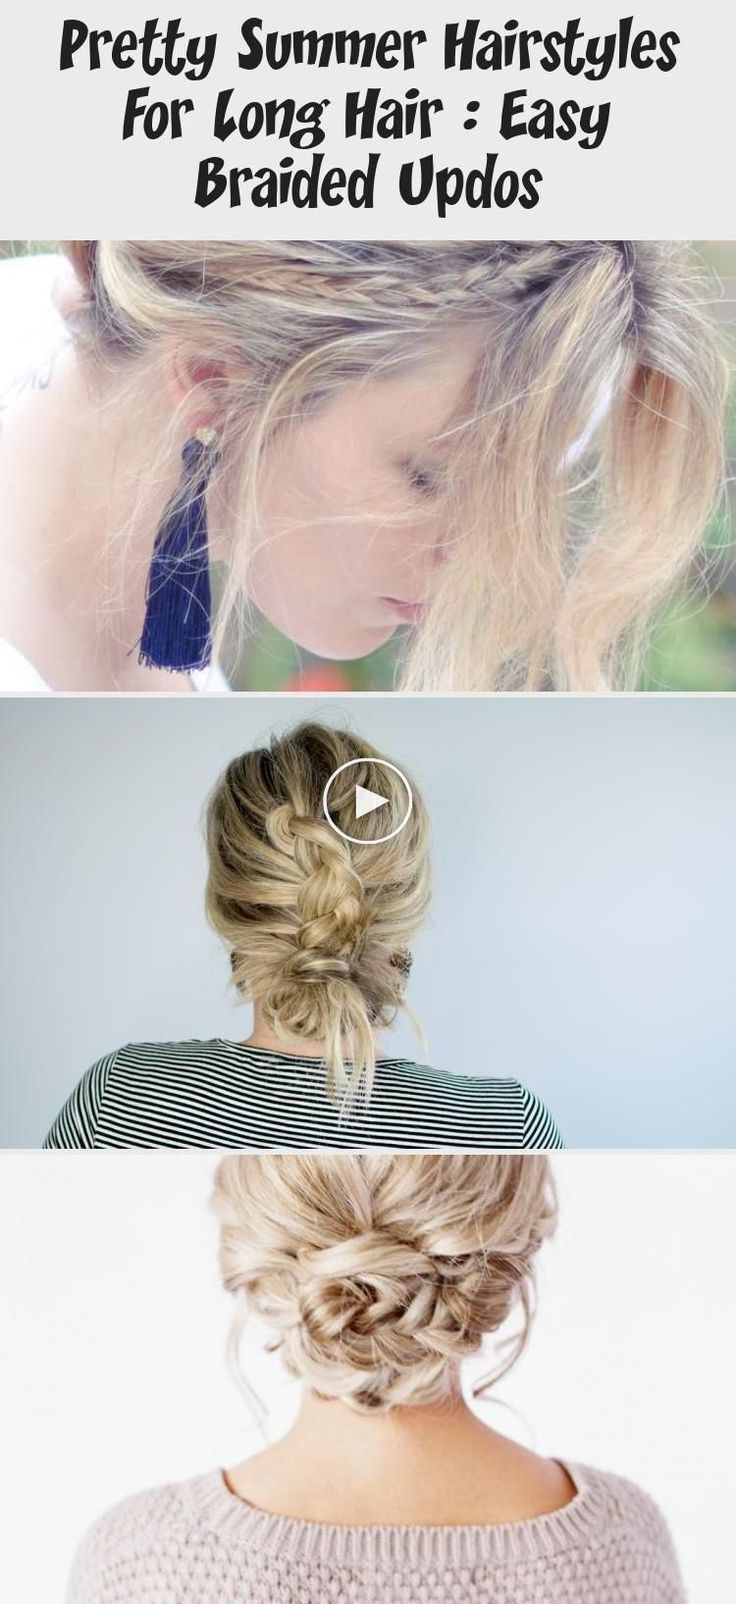 Mooie zomerse kapsels voor lang haar: Gemakkelijke gevlochten Updos - Kapsel,  #gemakkelijke #gemakkelijkekapselslang #gevlochten #haar #Kapsel #kapsels #lang #Mooie #Updos #voor #zomerse